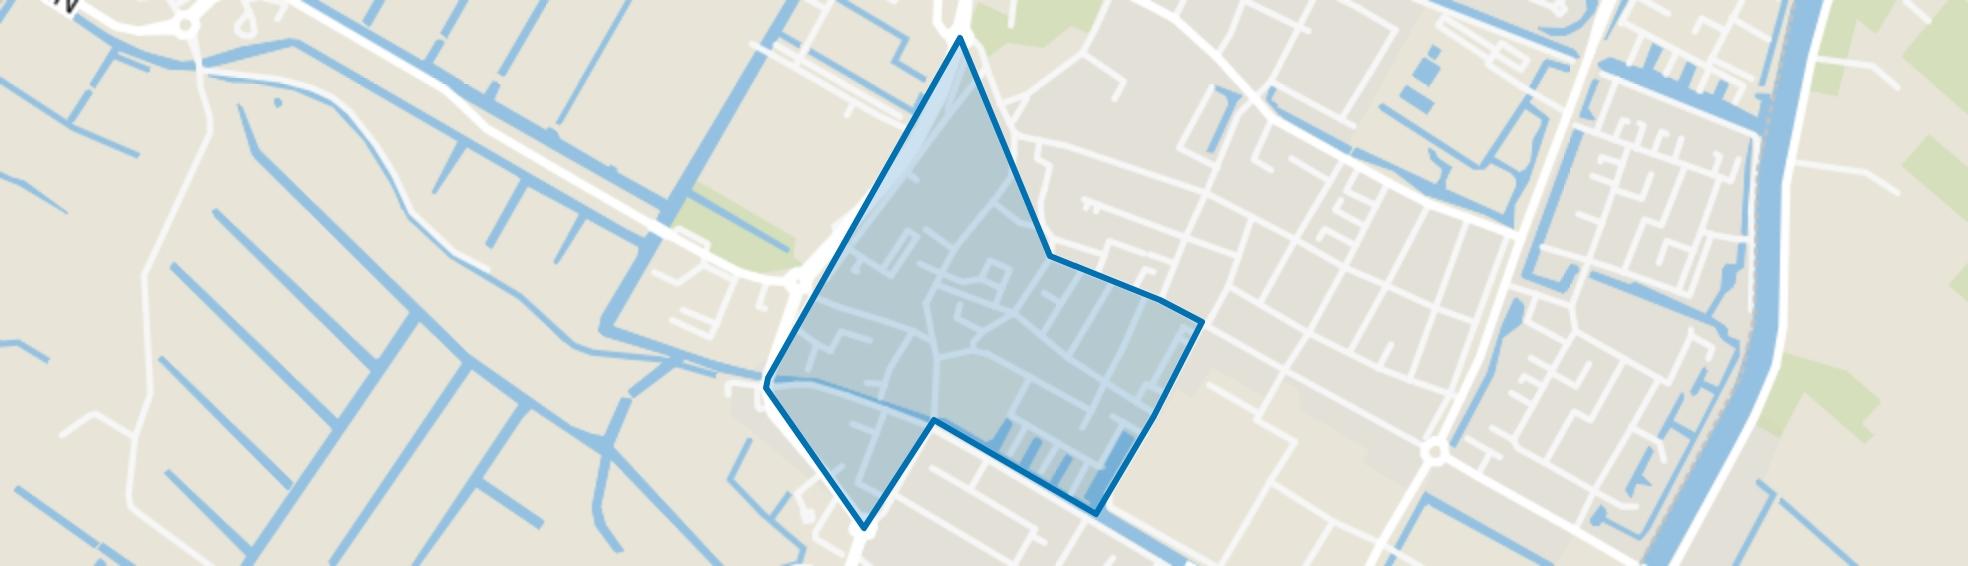 Centrum, Hillegom map